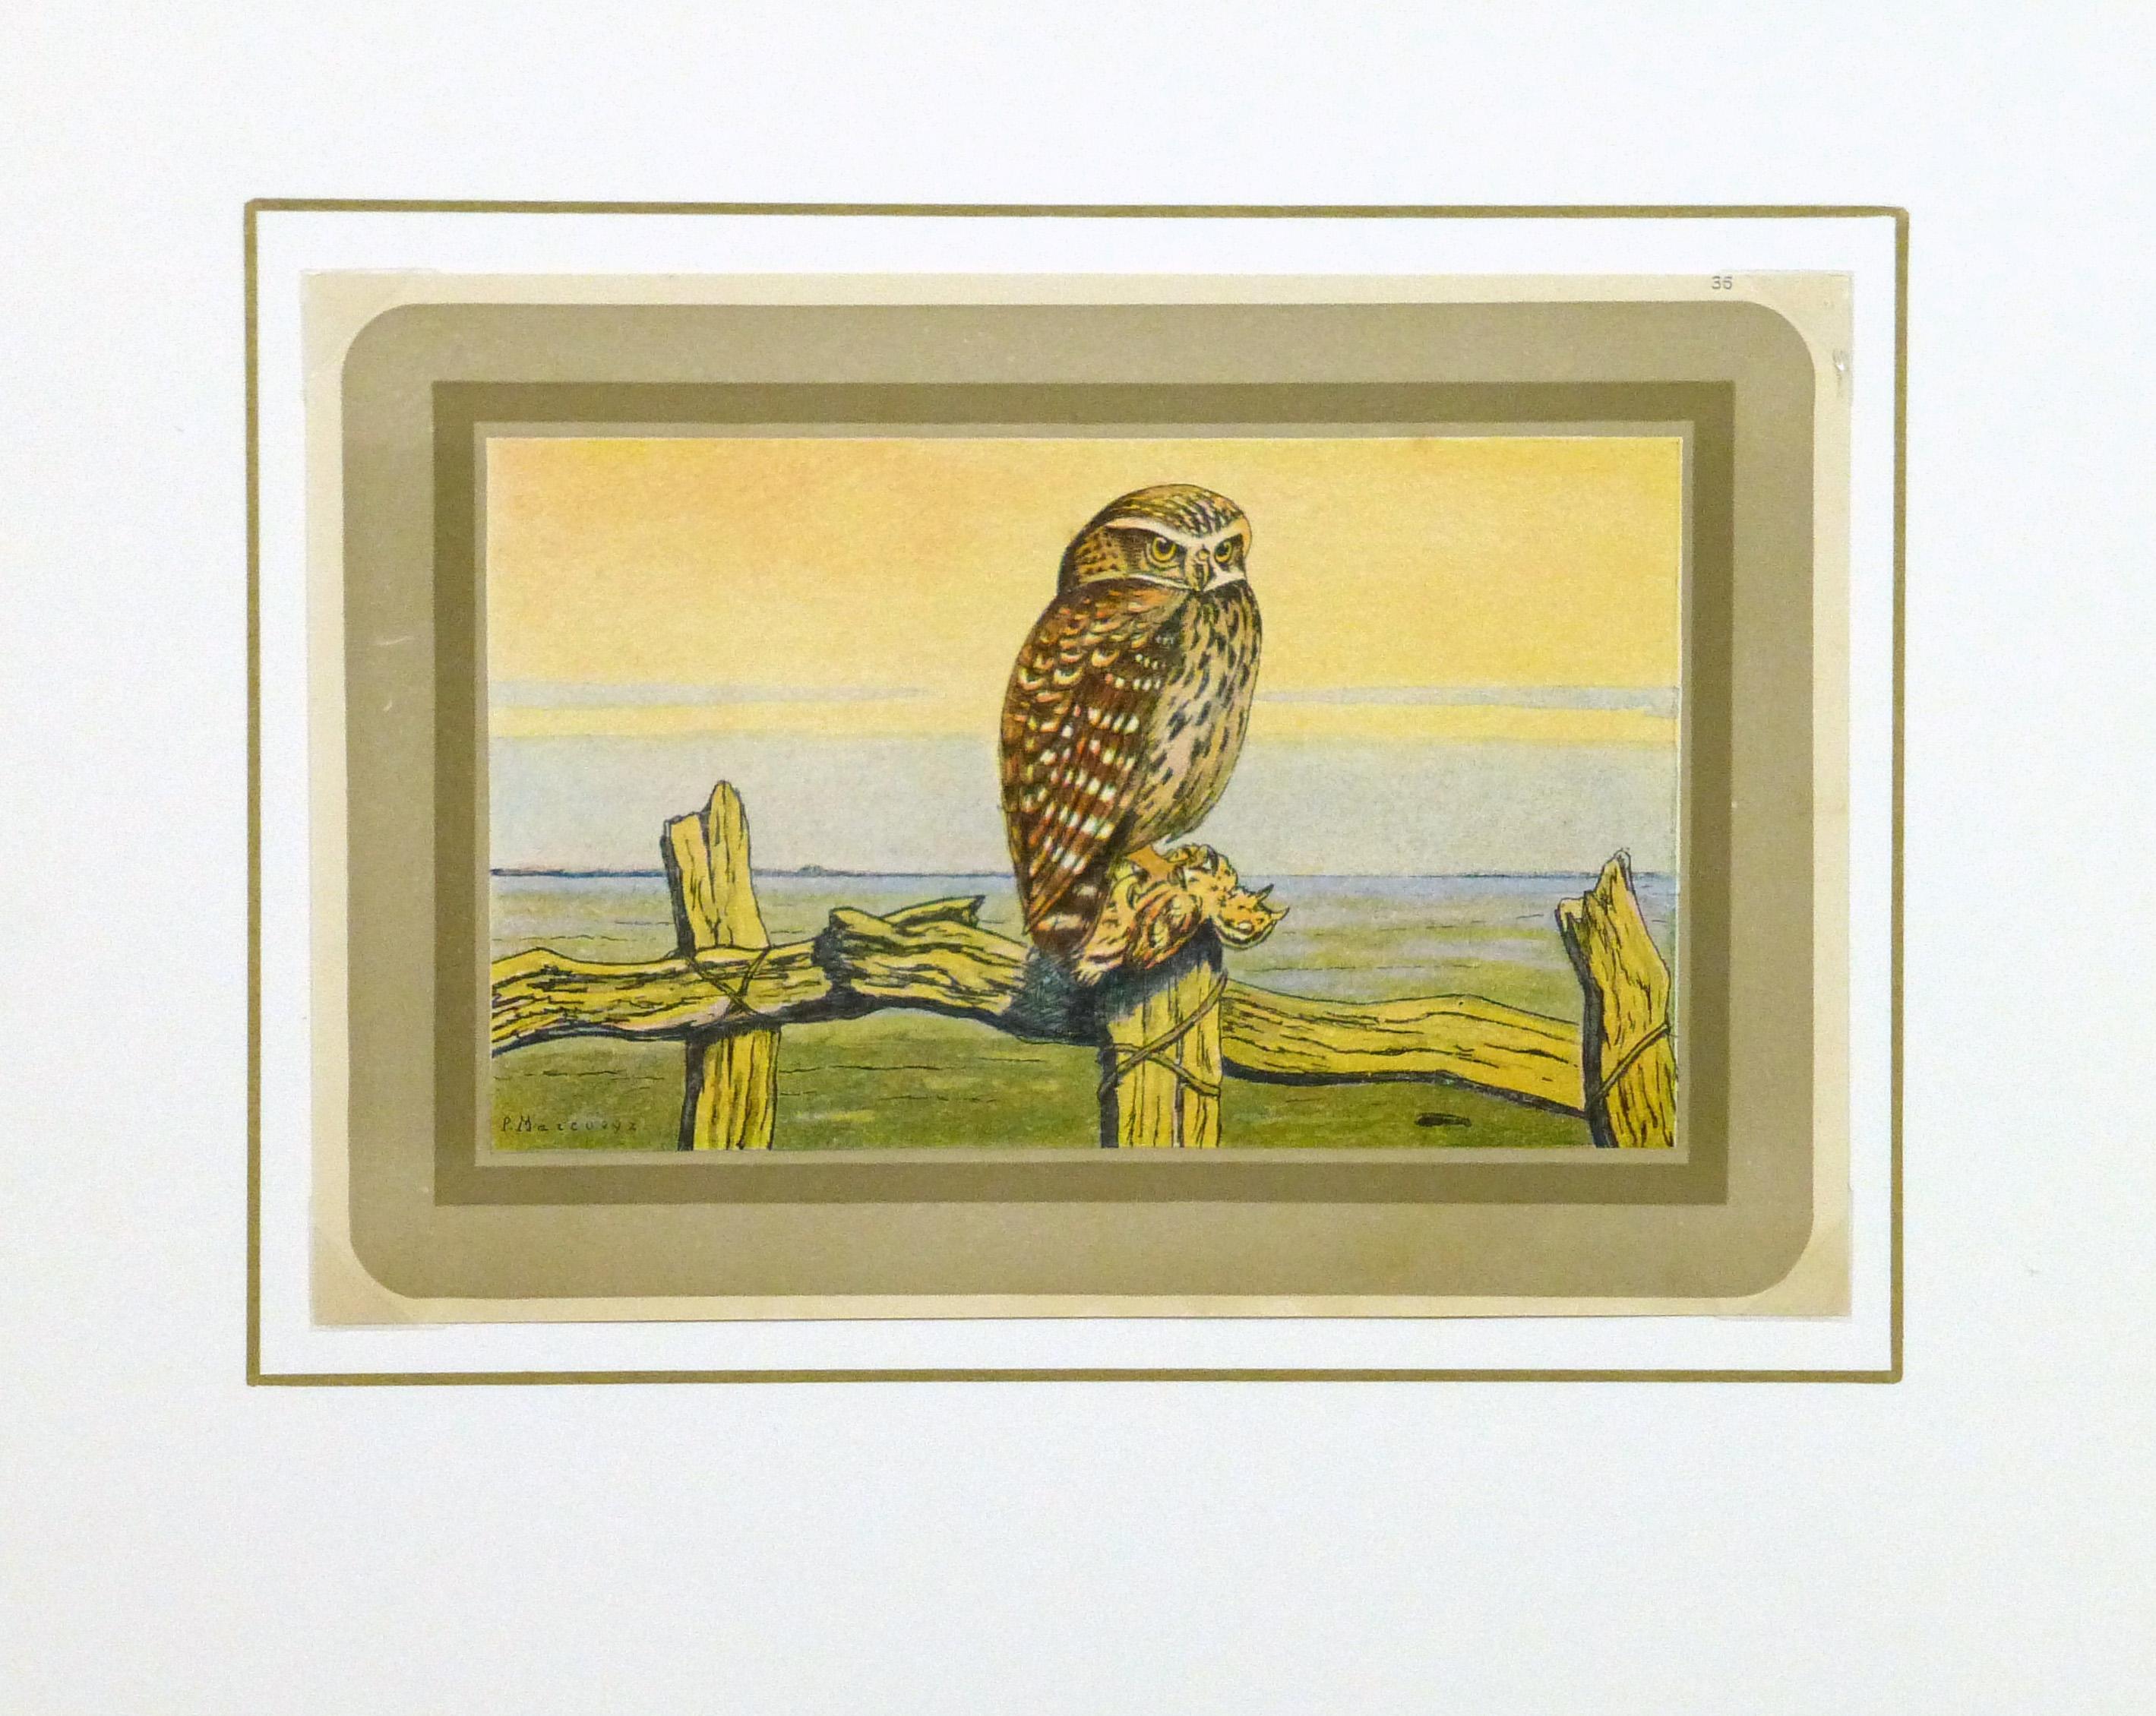 Burrowing Owl Print, Circa 1920-matted-9213K